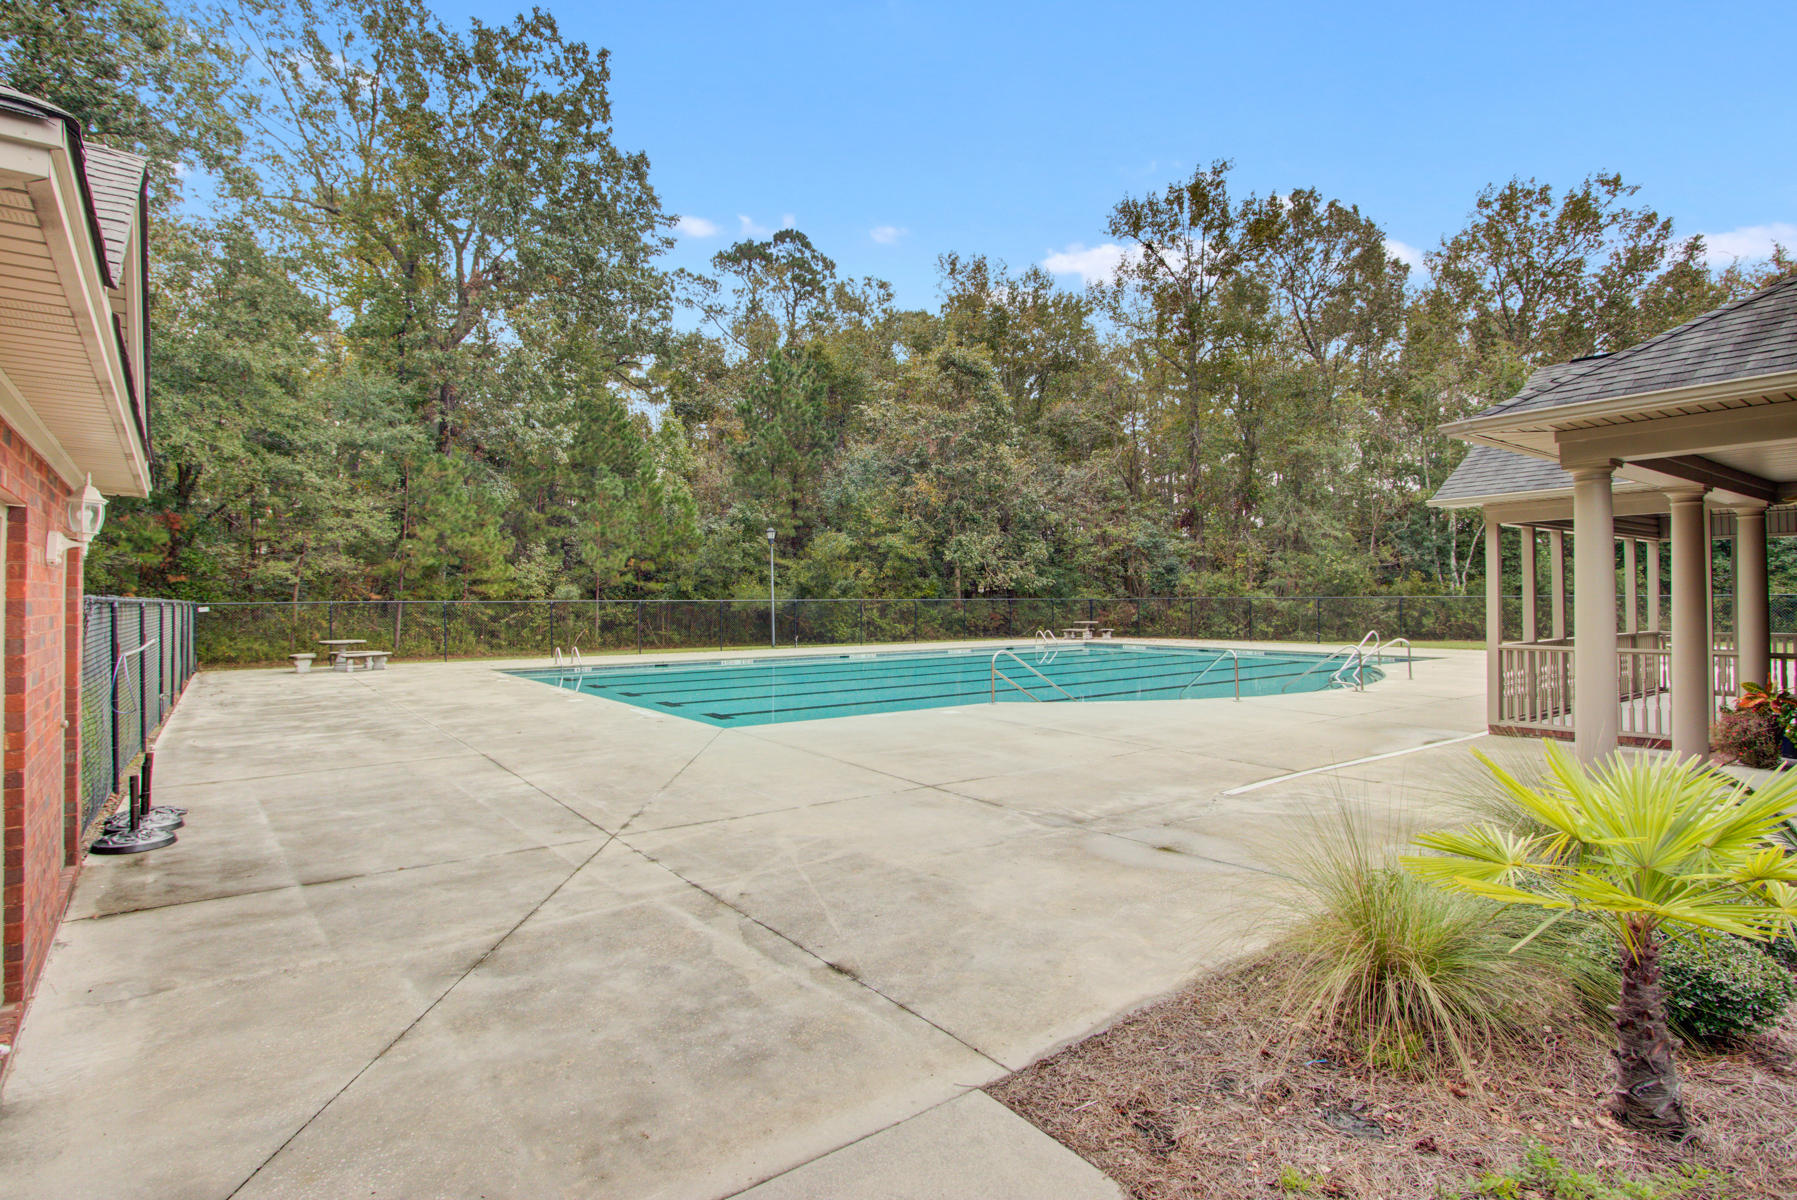 Cedar Grove Homes For Sale - 8733 Millerville, North Charleston, SC - 41